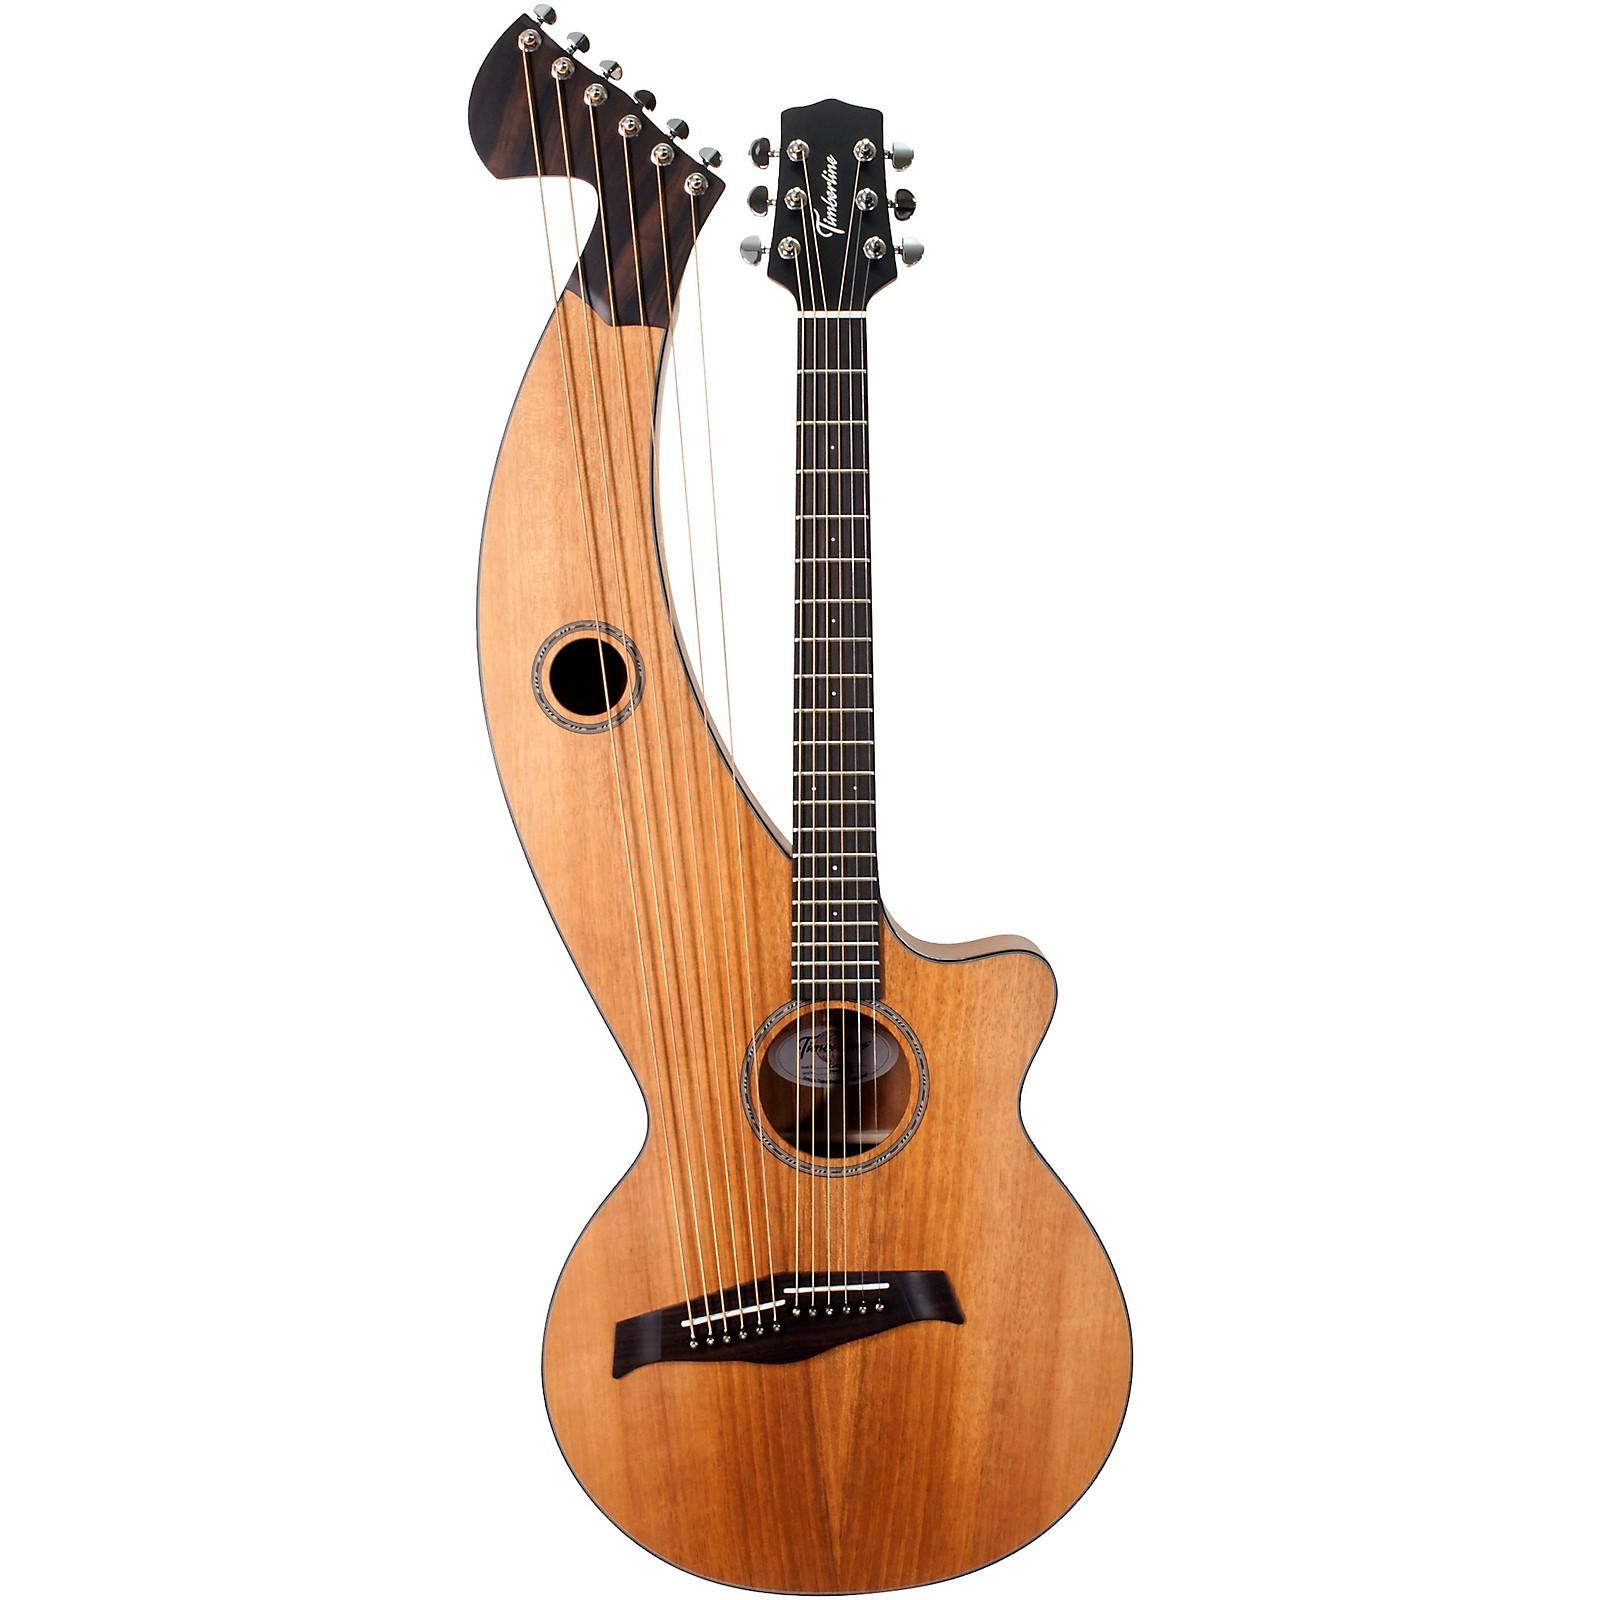 Timberline Guitars T20HGc Solid Tropical Mahogany 12-String Cutaway Acoustic-Electric Harp Guitar